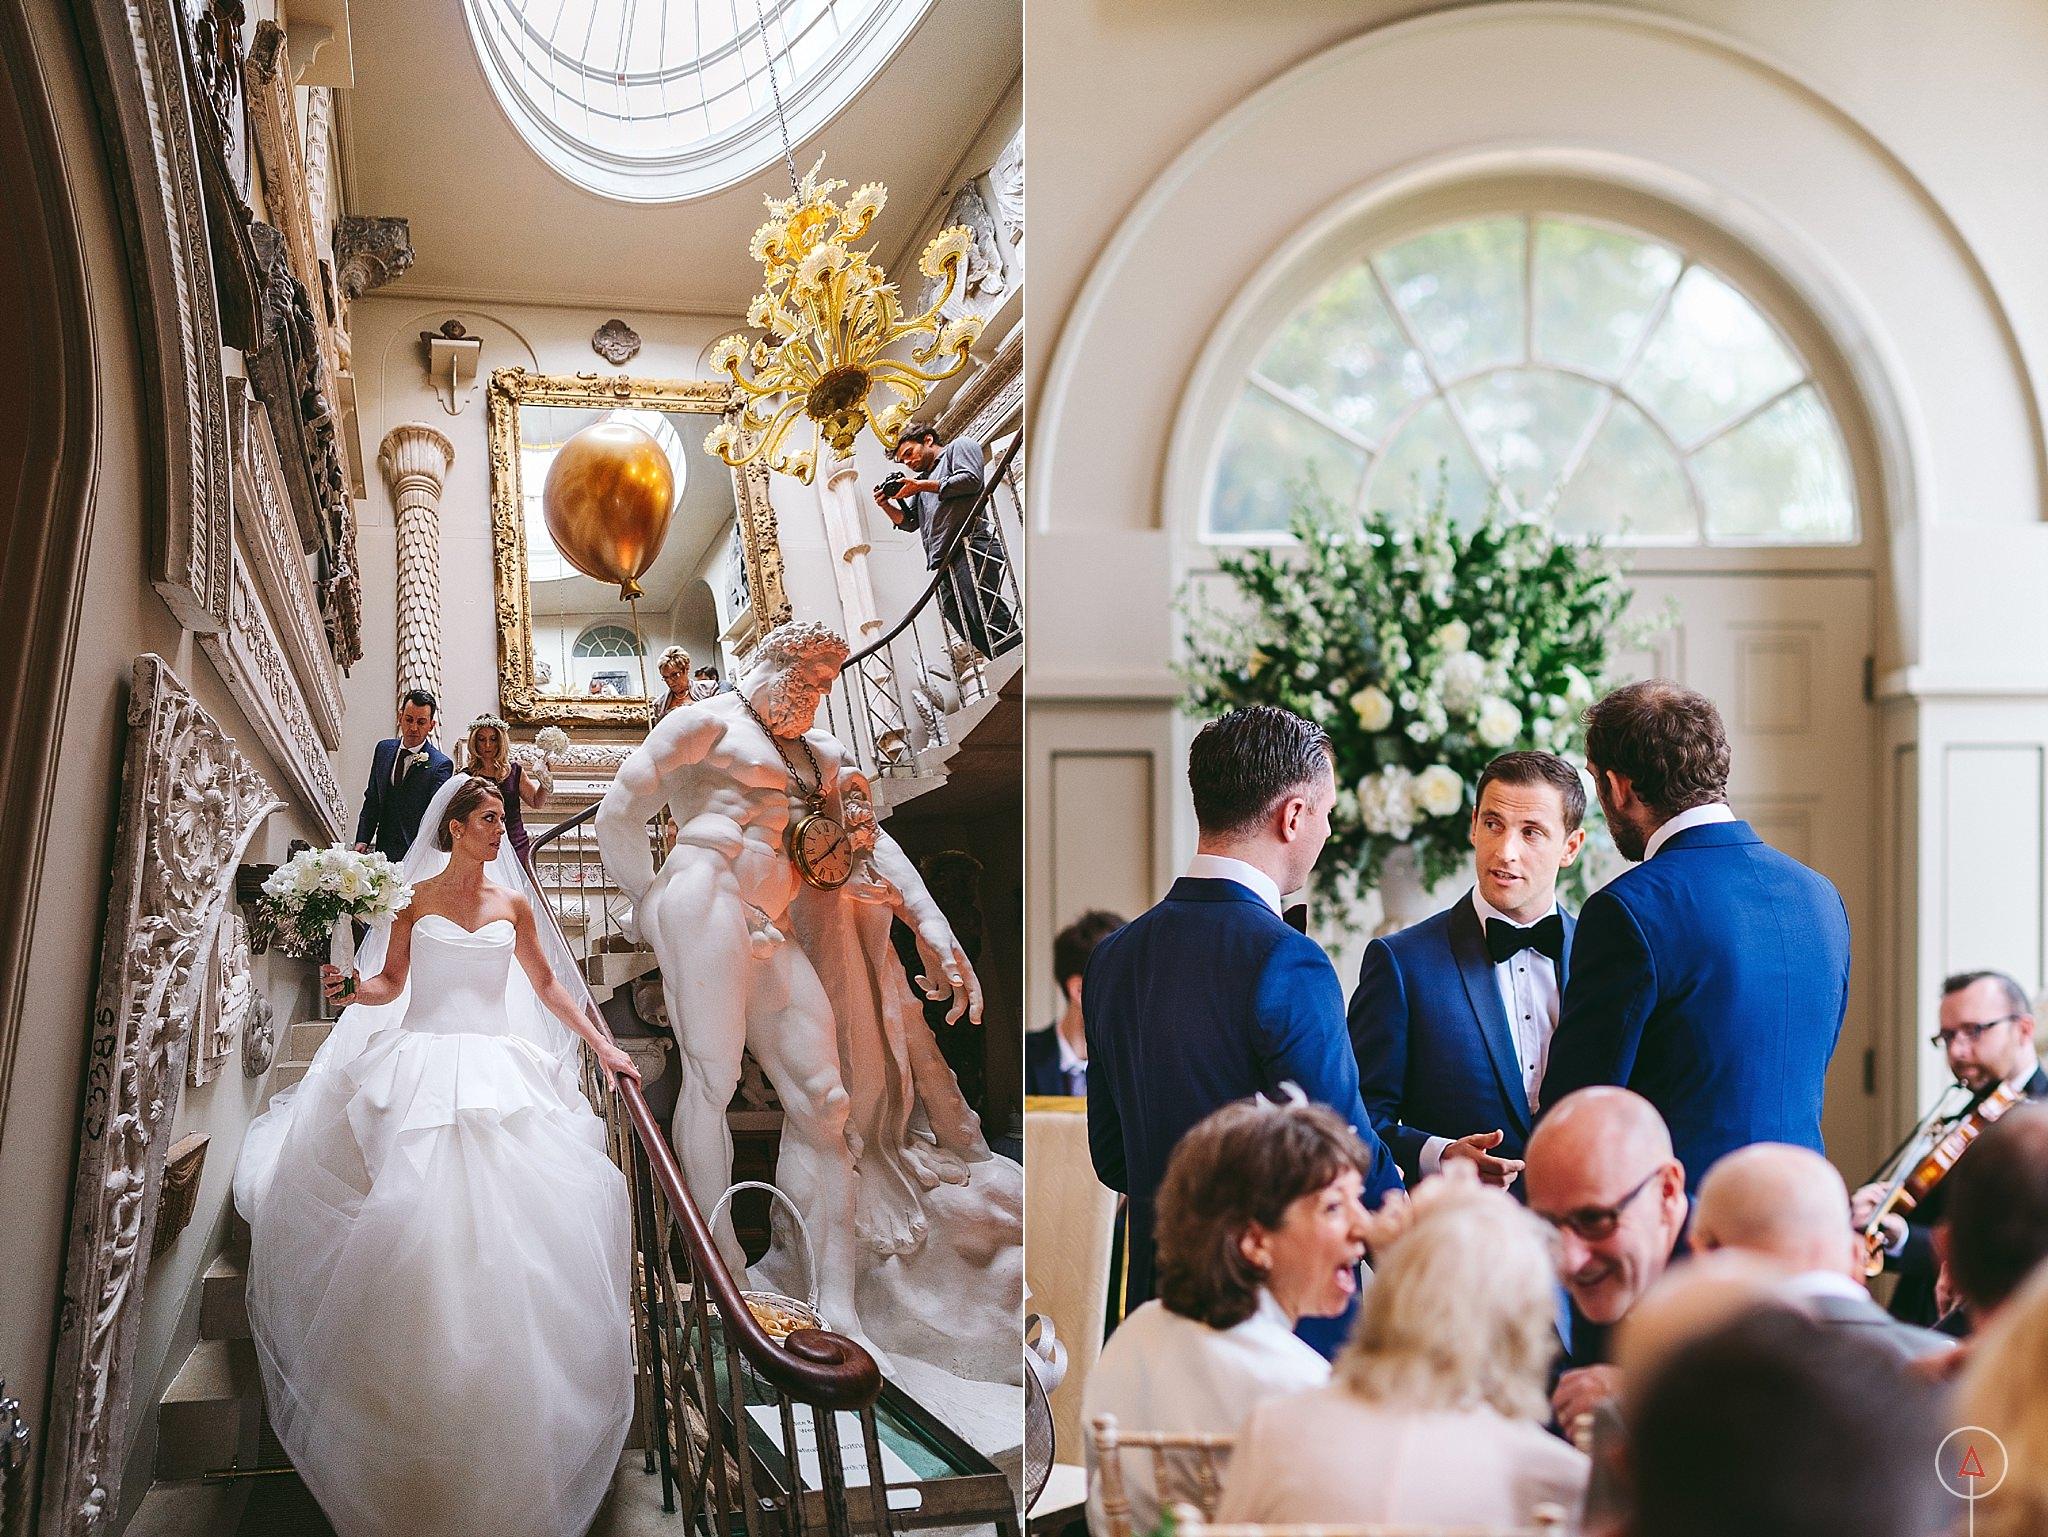 cardiff-wedding-photographer-aga-tomaszek_0200